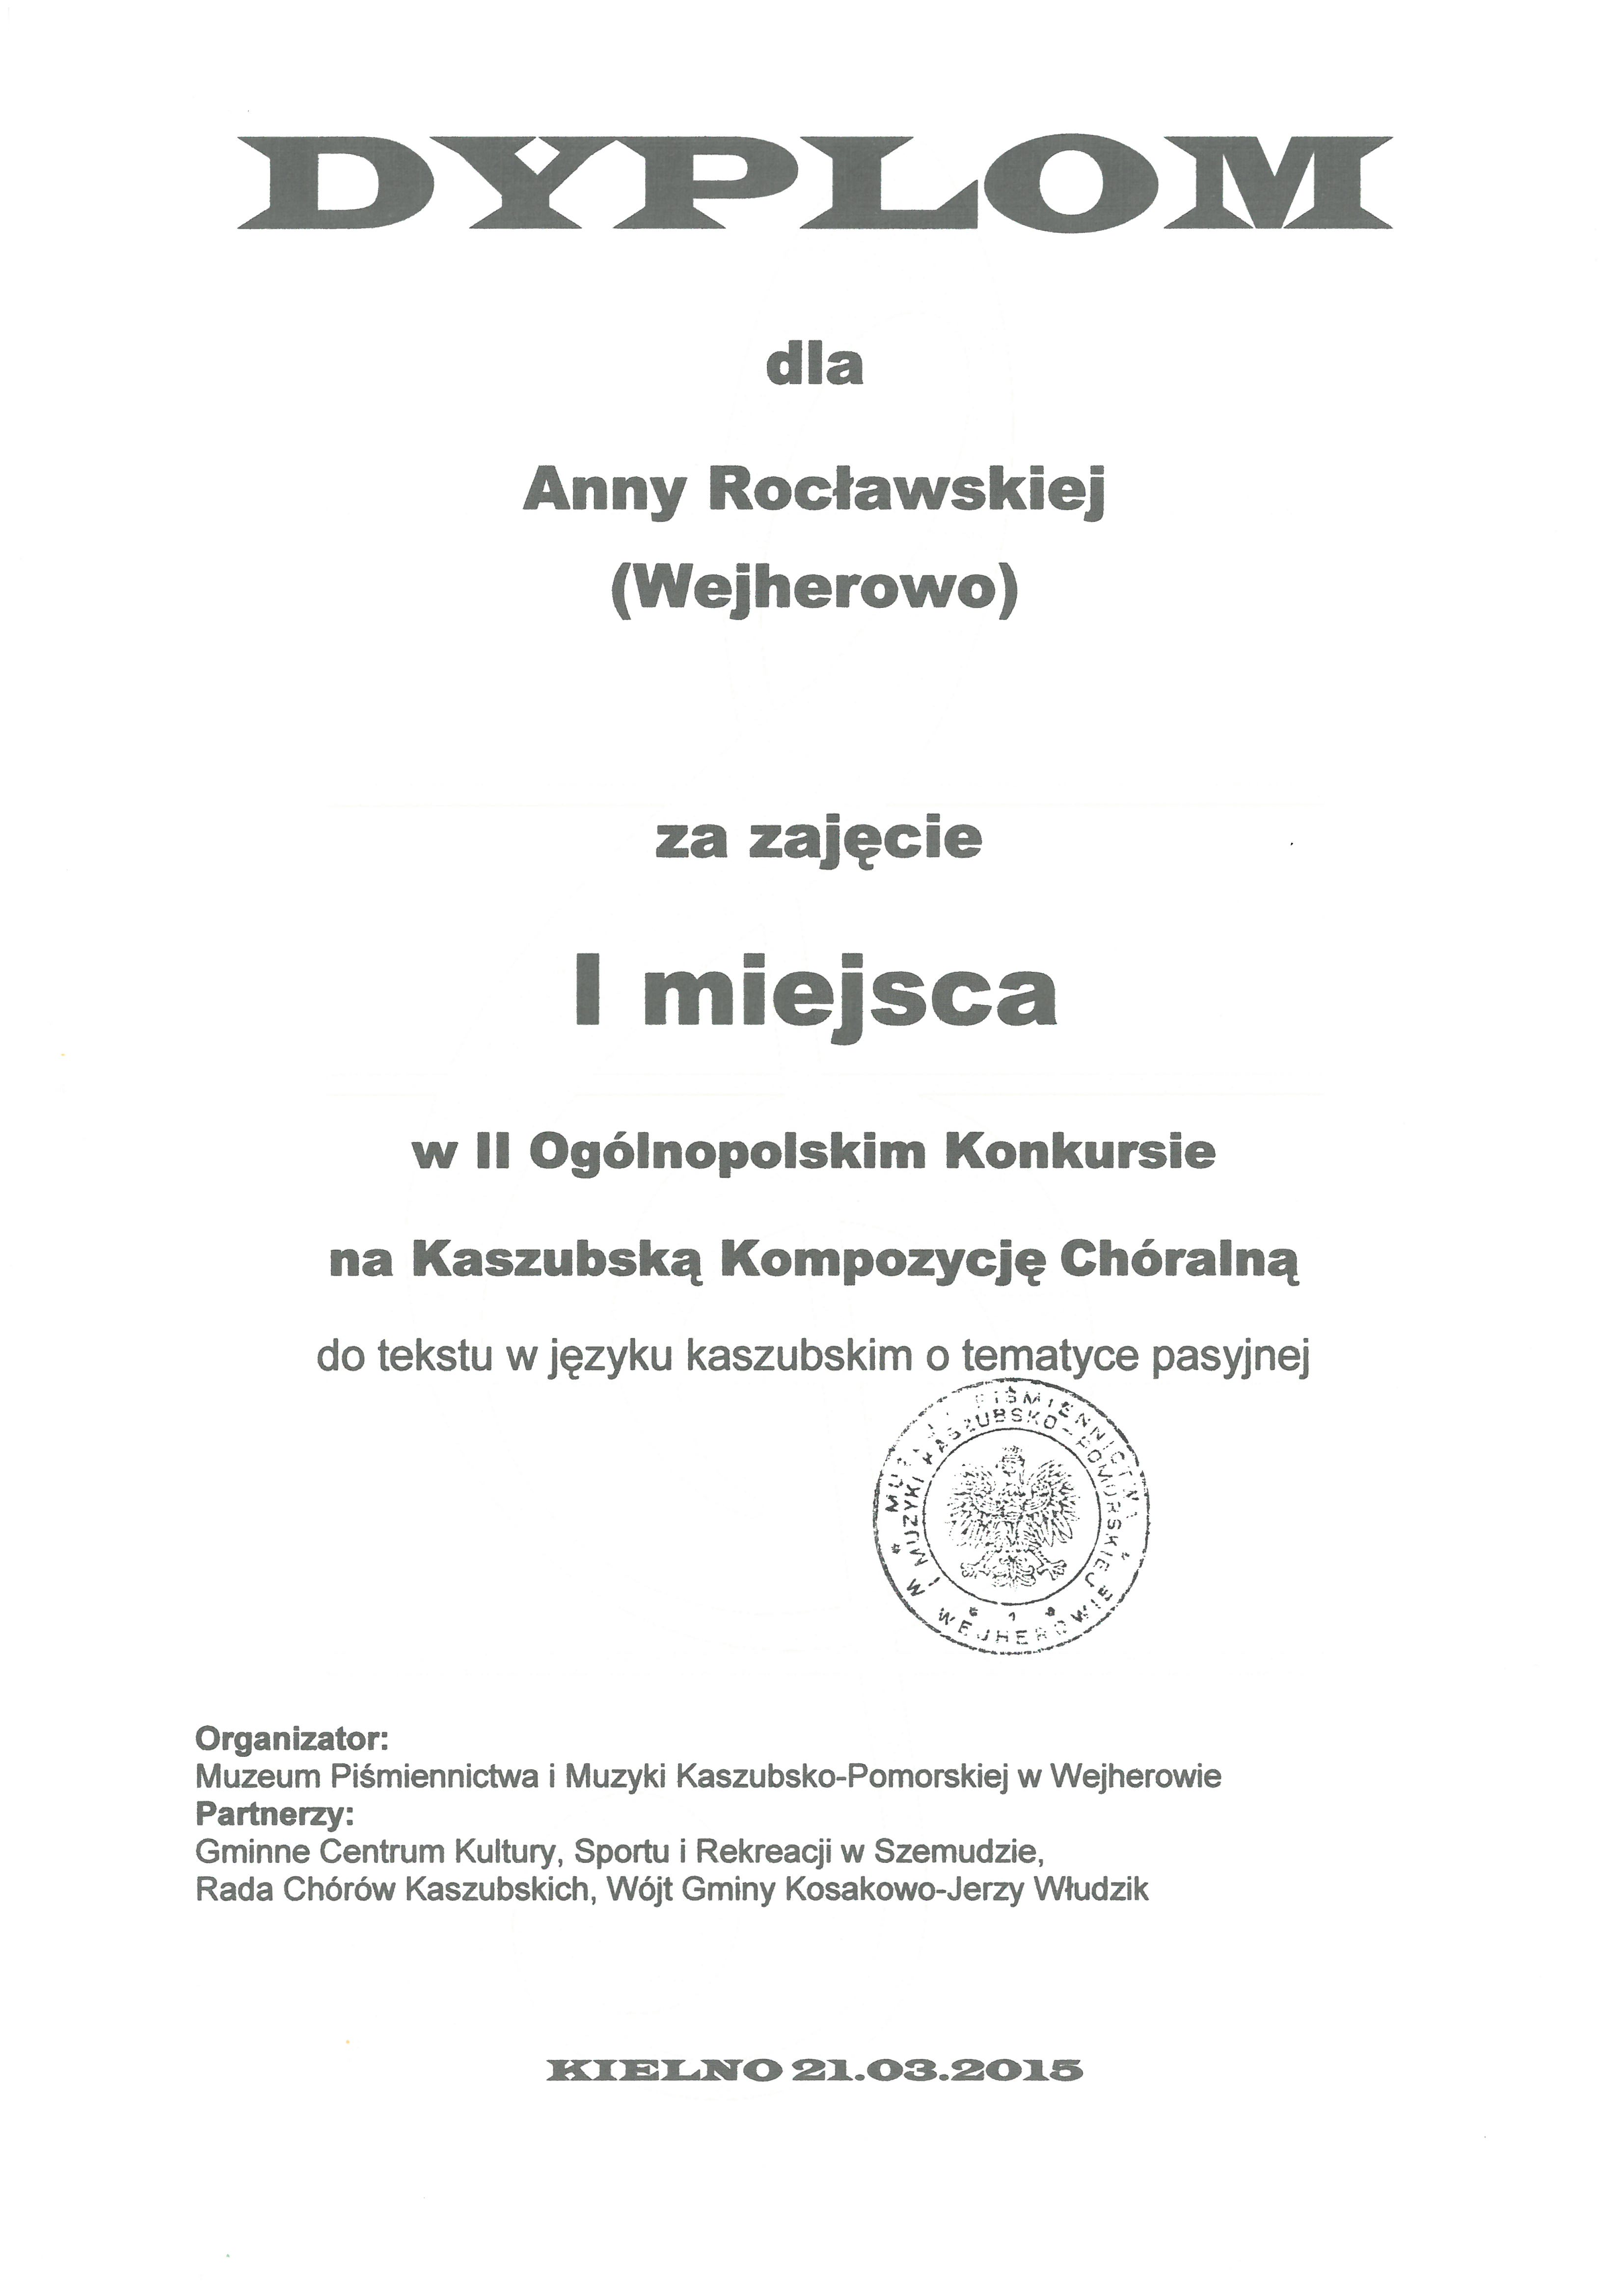 Roclawska_Kielno_2015_dyplom1